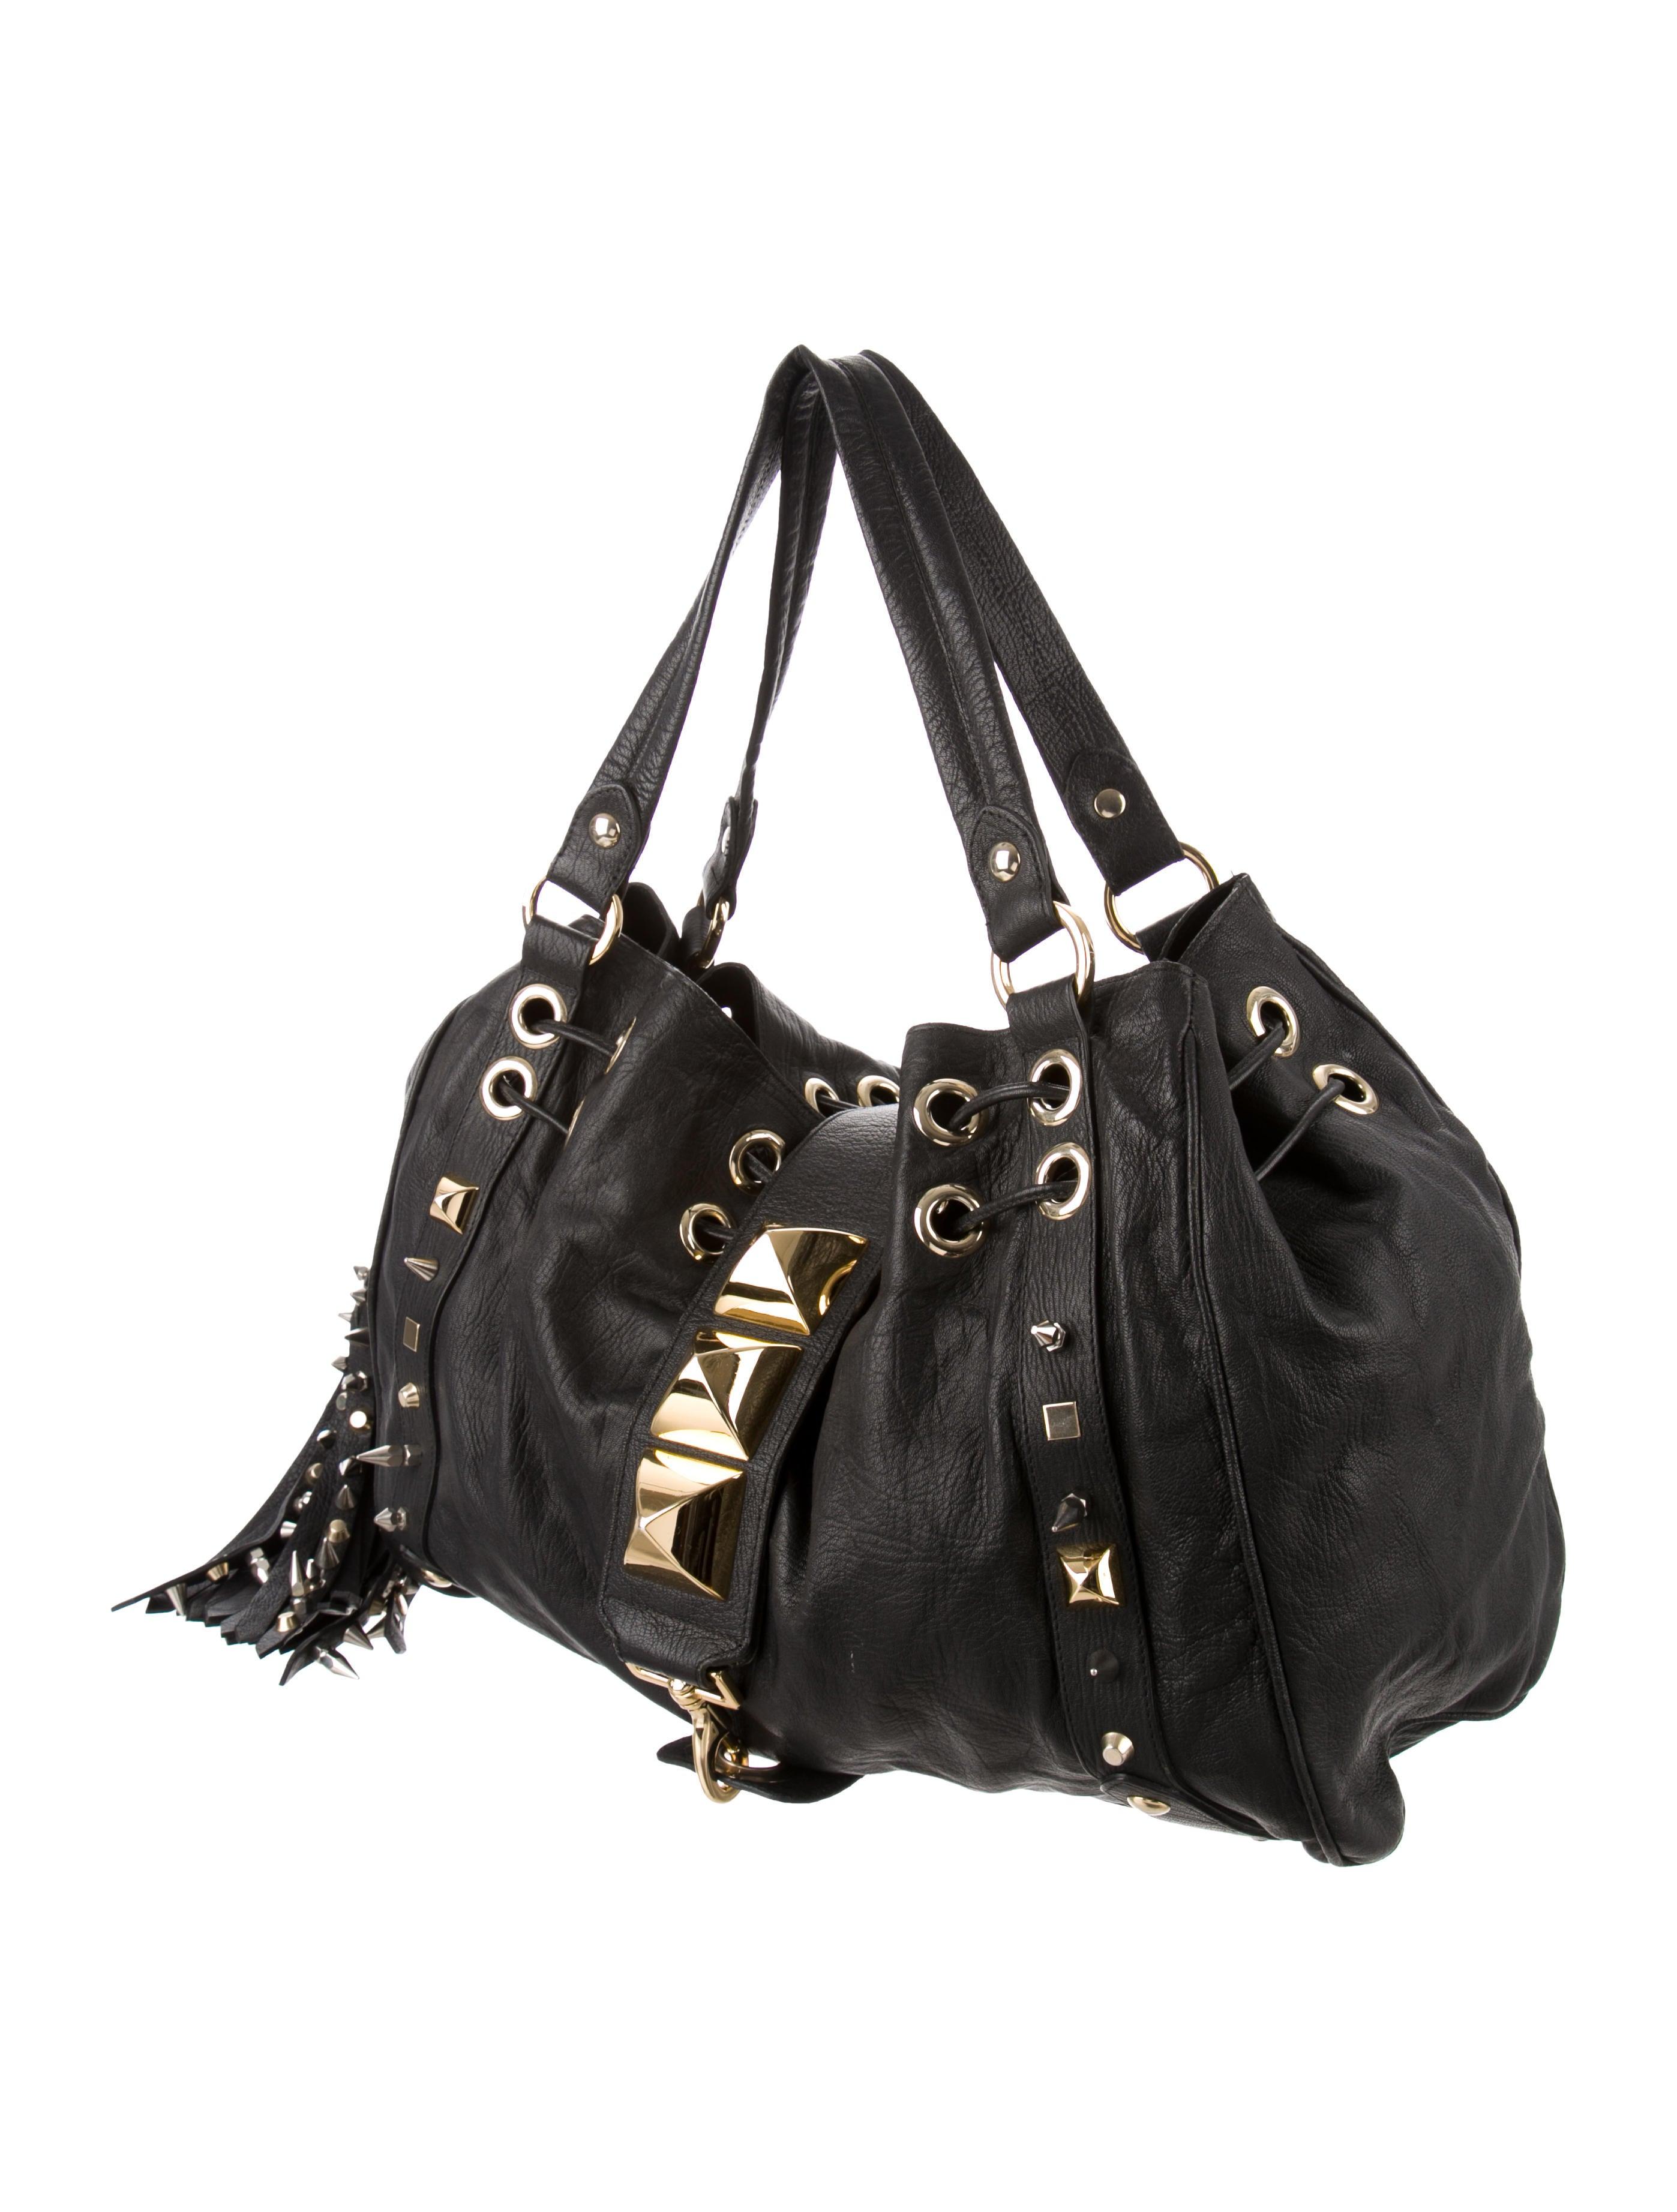 5a4dbc21434c ... Mulberry Bag Shoulder amp  Stud Tassel Embellished r0Xwrqf ...